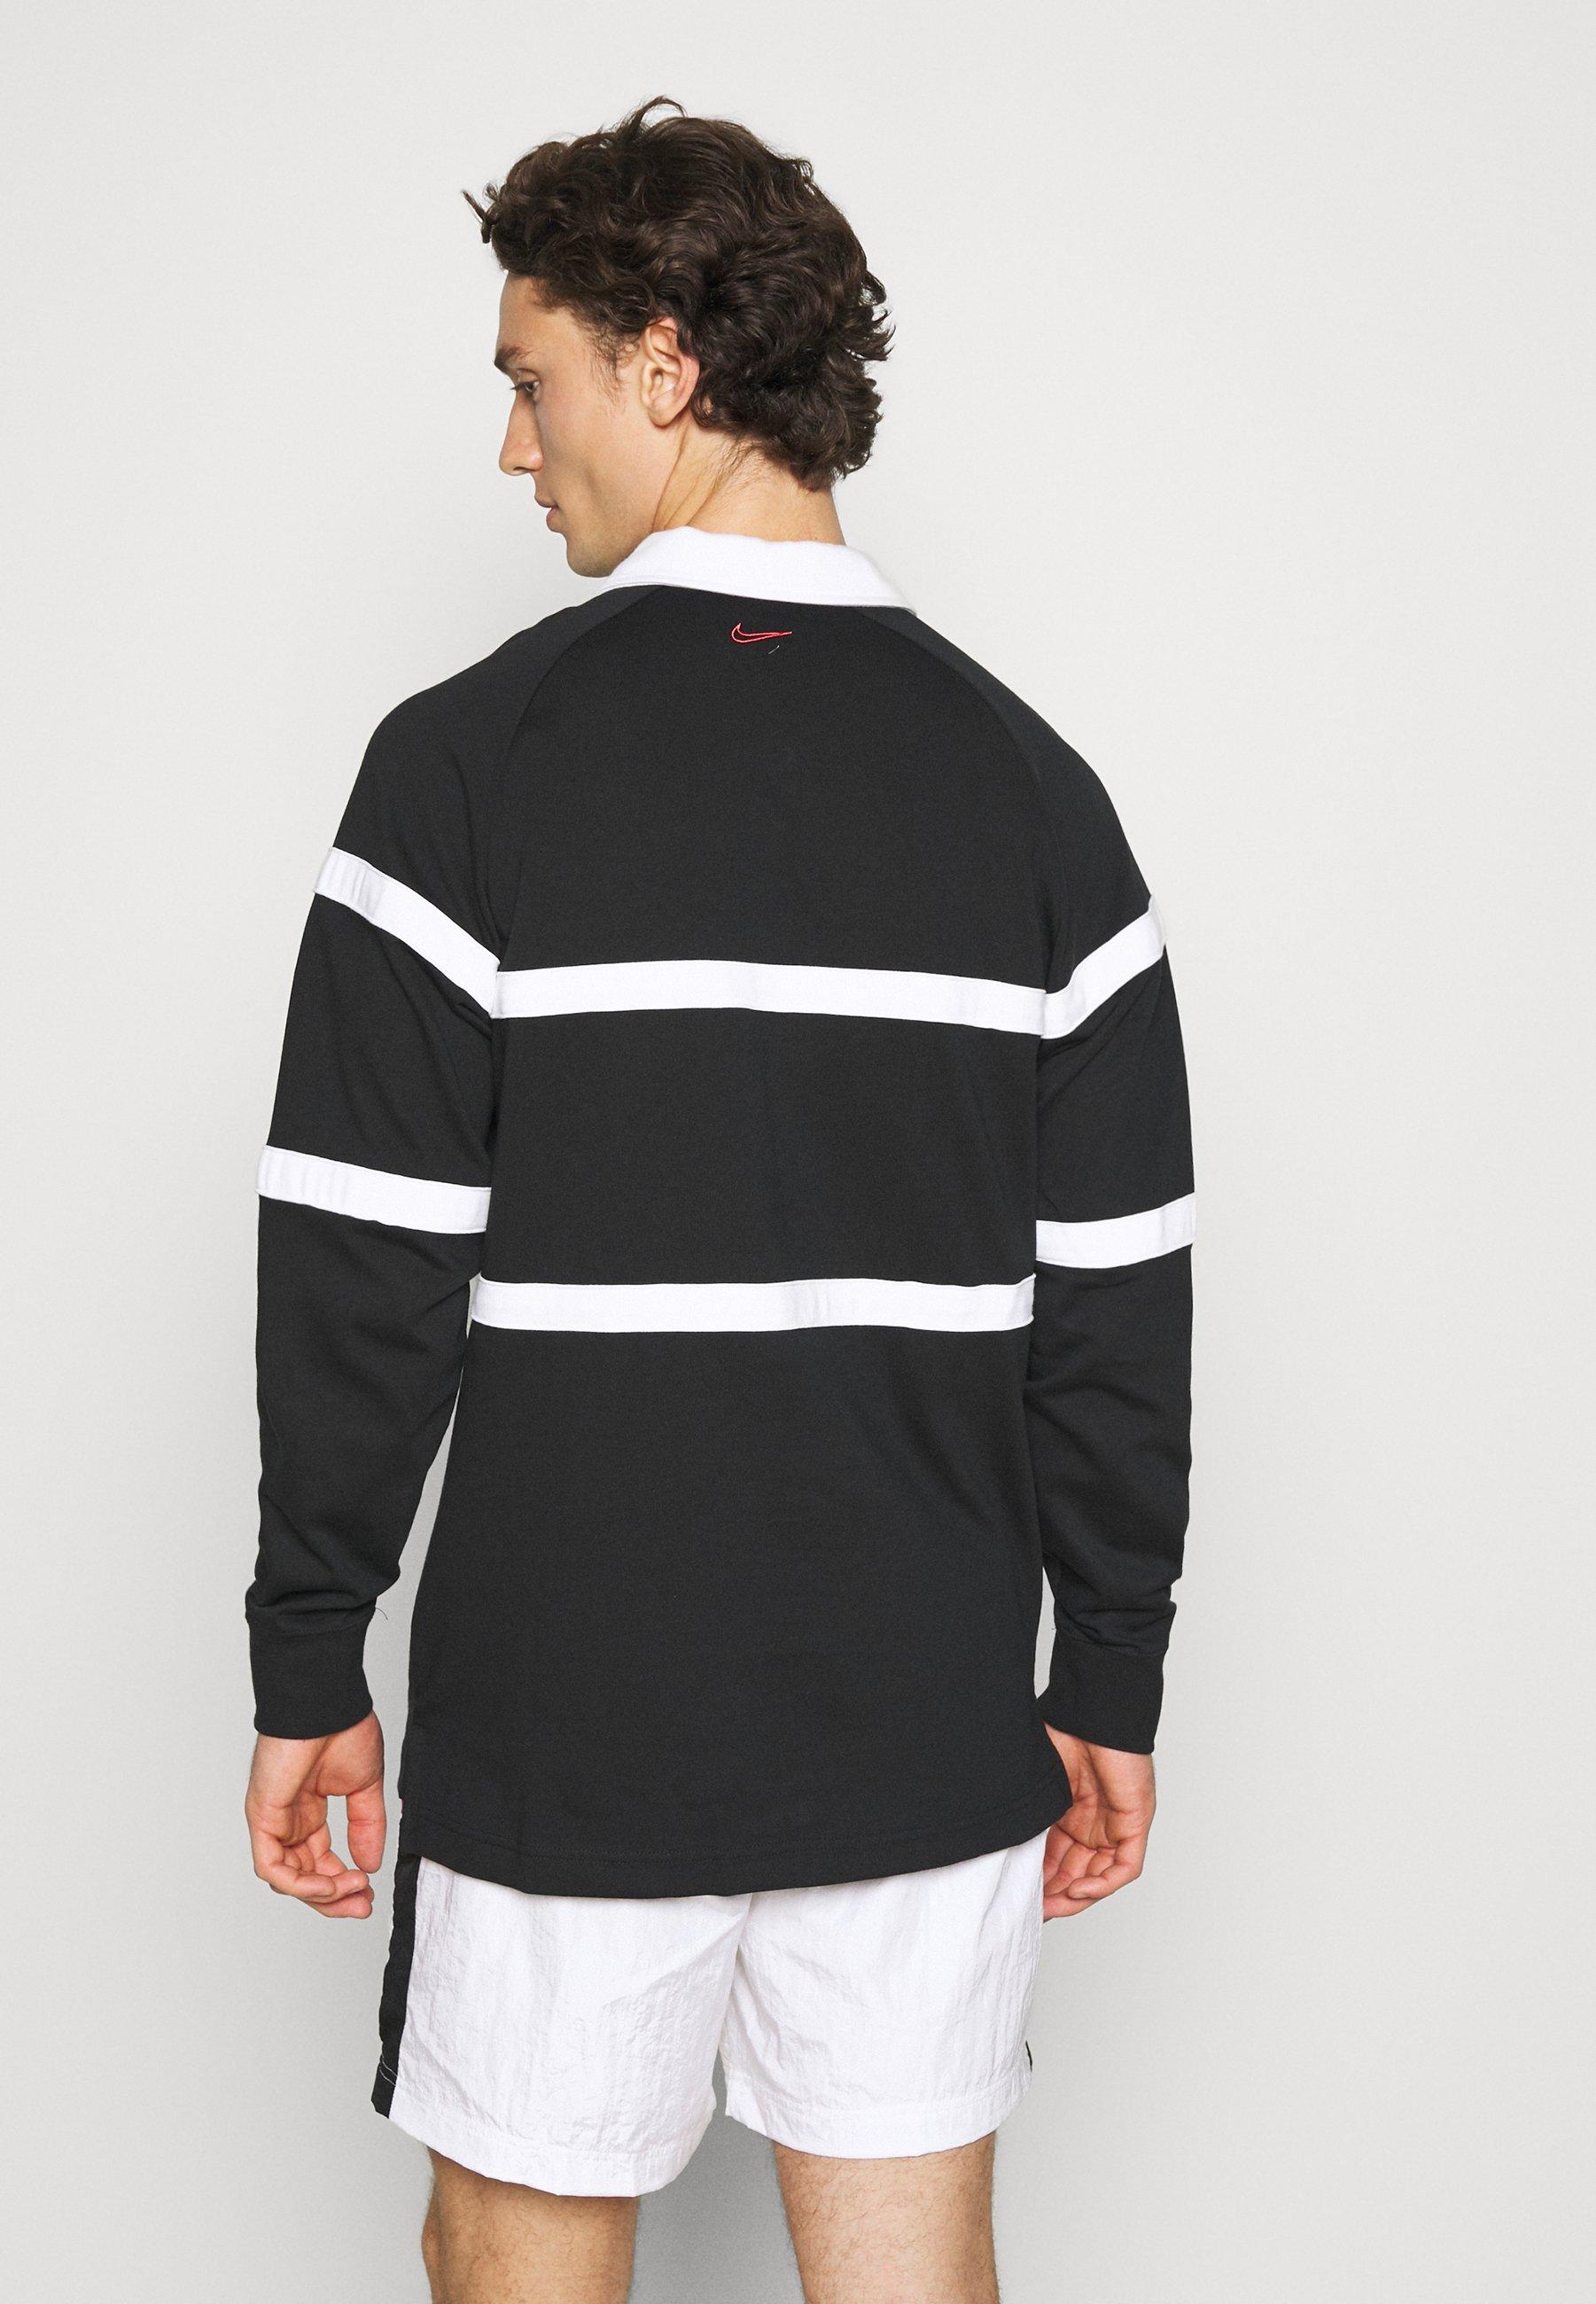 Nike Sportswear RUGBY - Polo shirt - black/white/green tTMYS